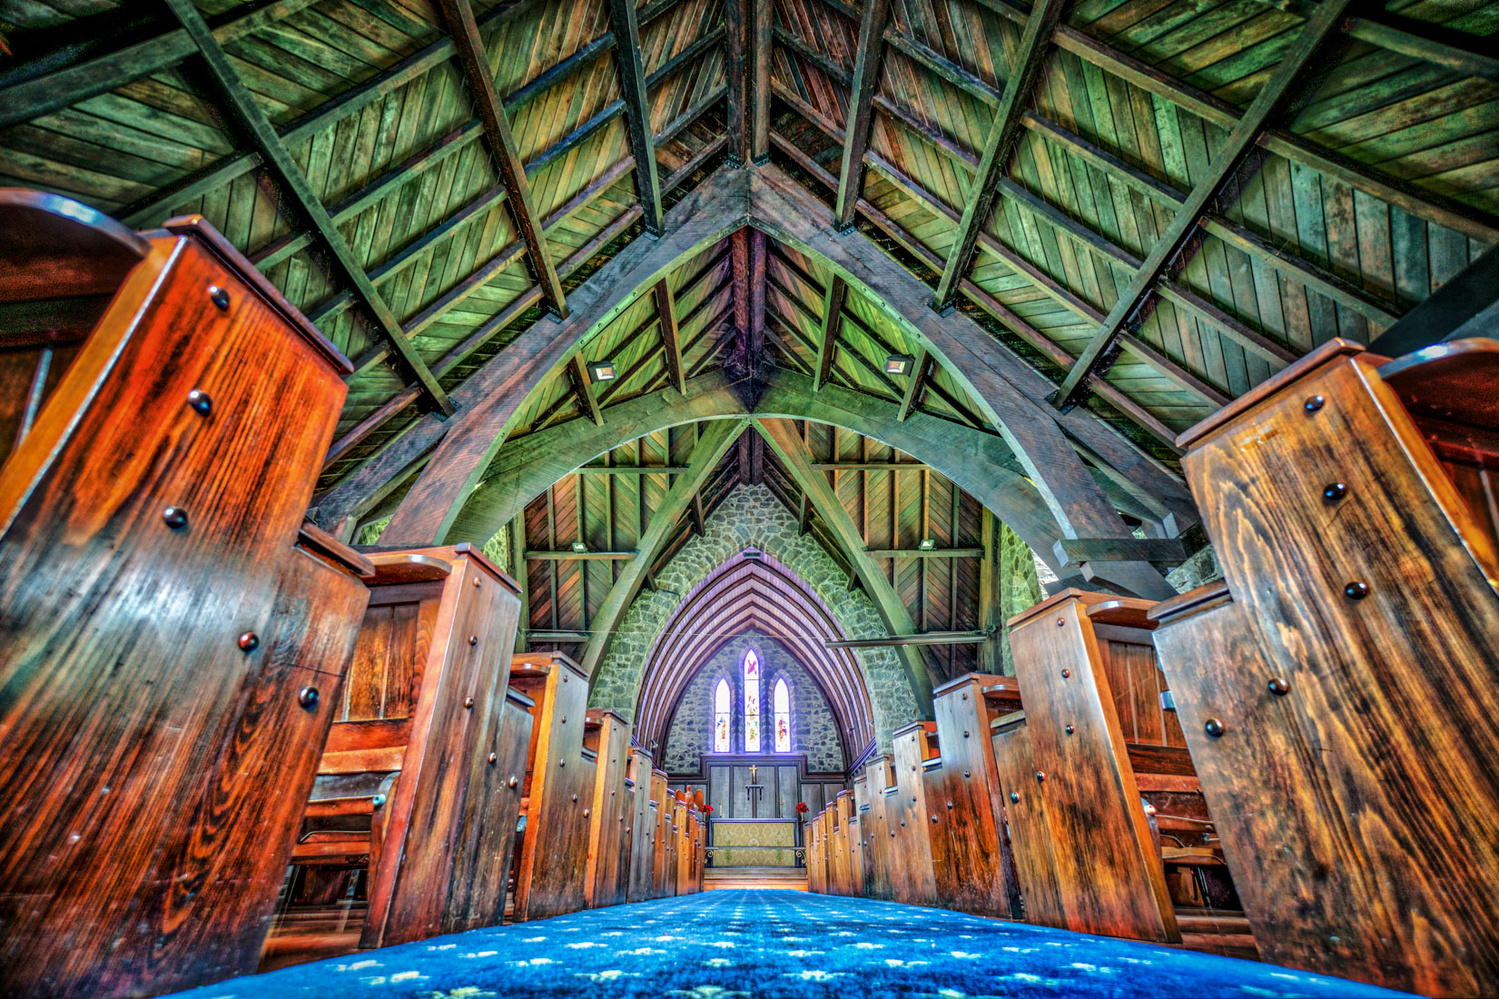 St Paul's Anglican Church by Keir Briscoe